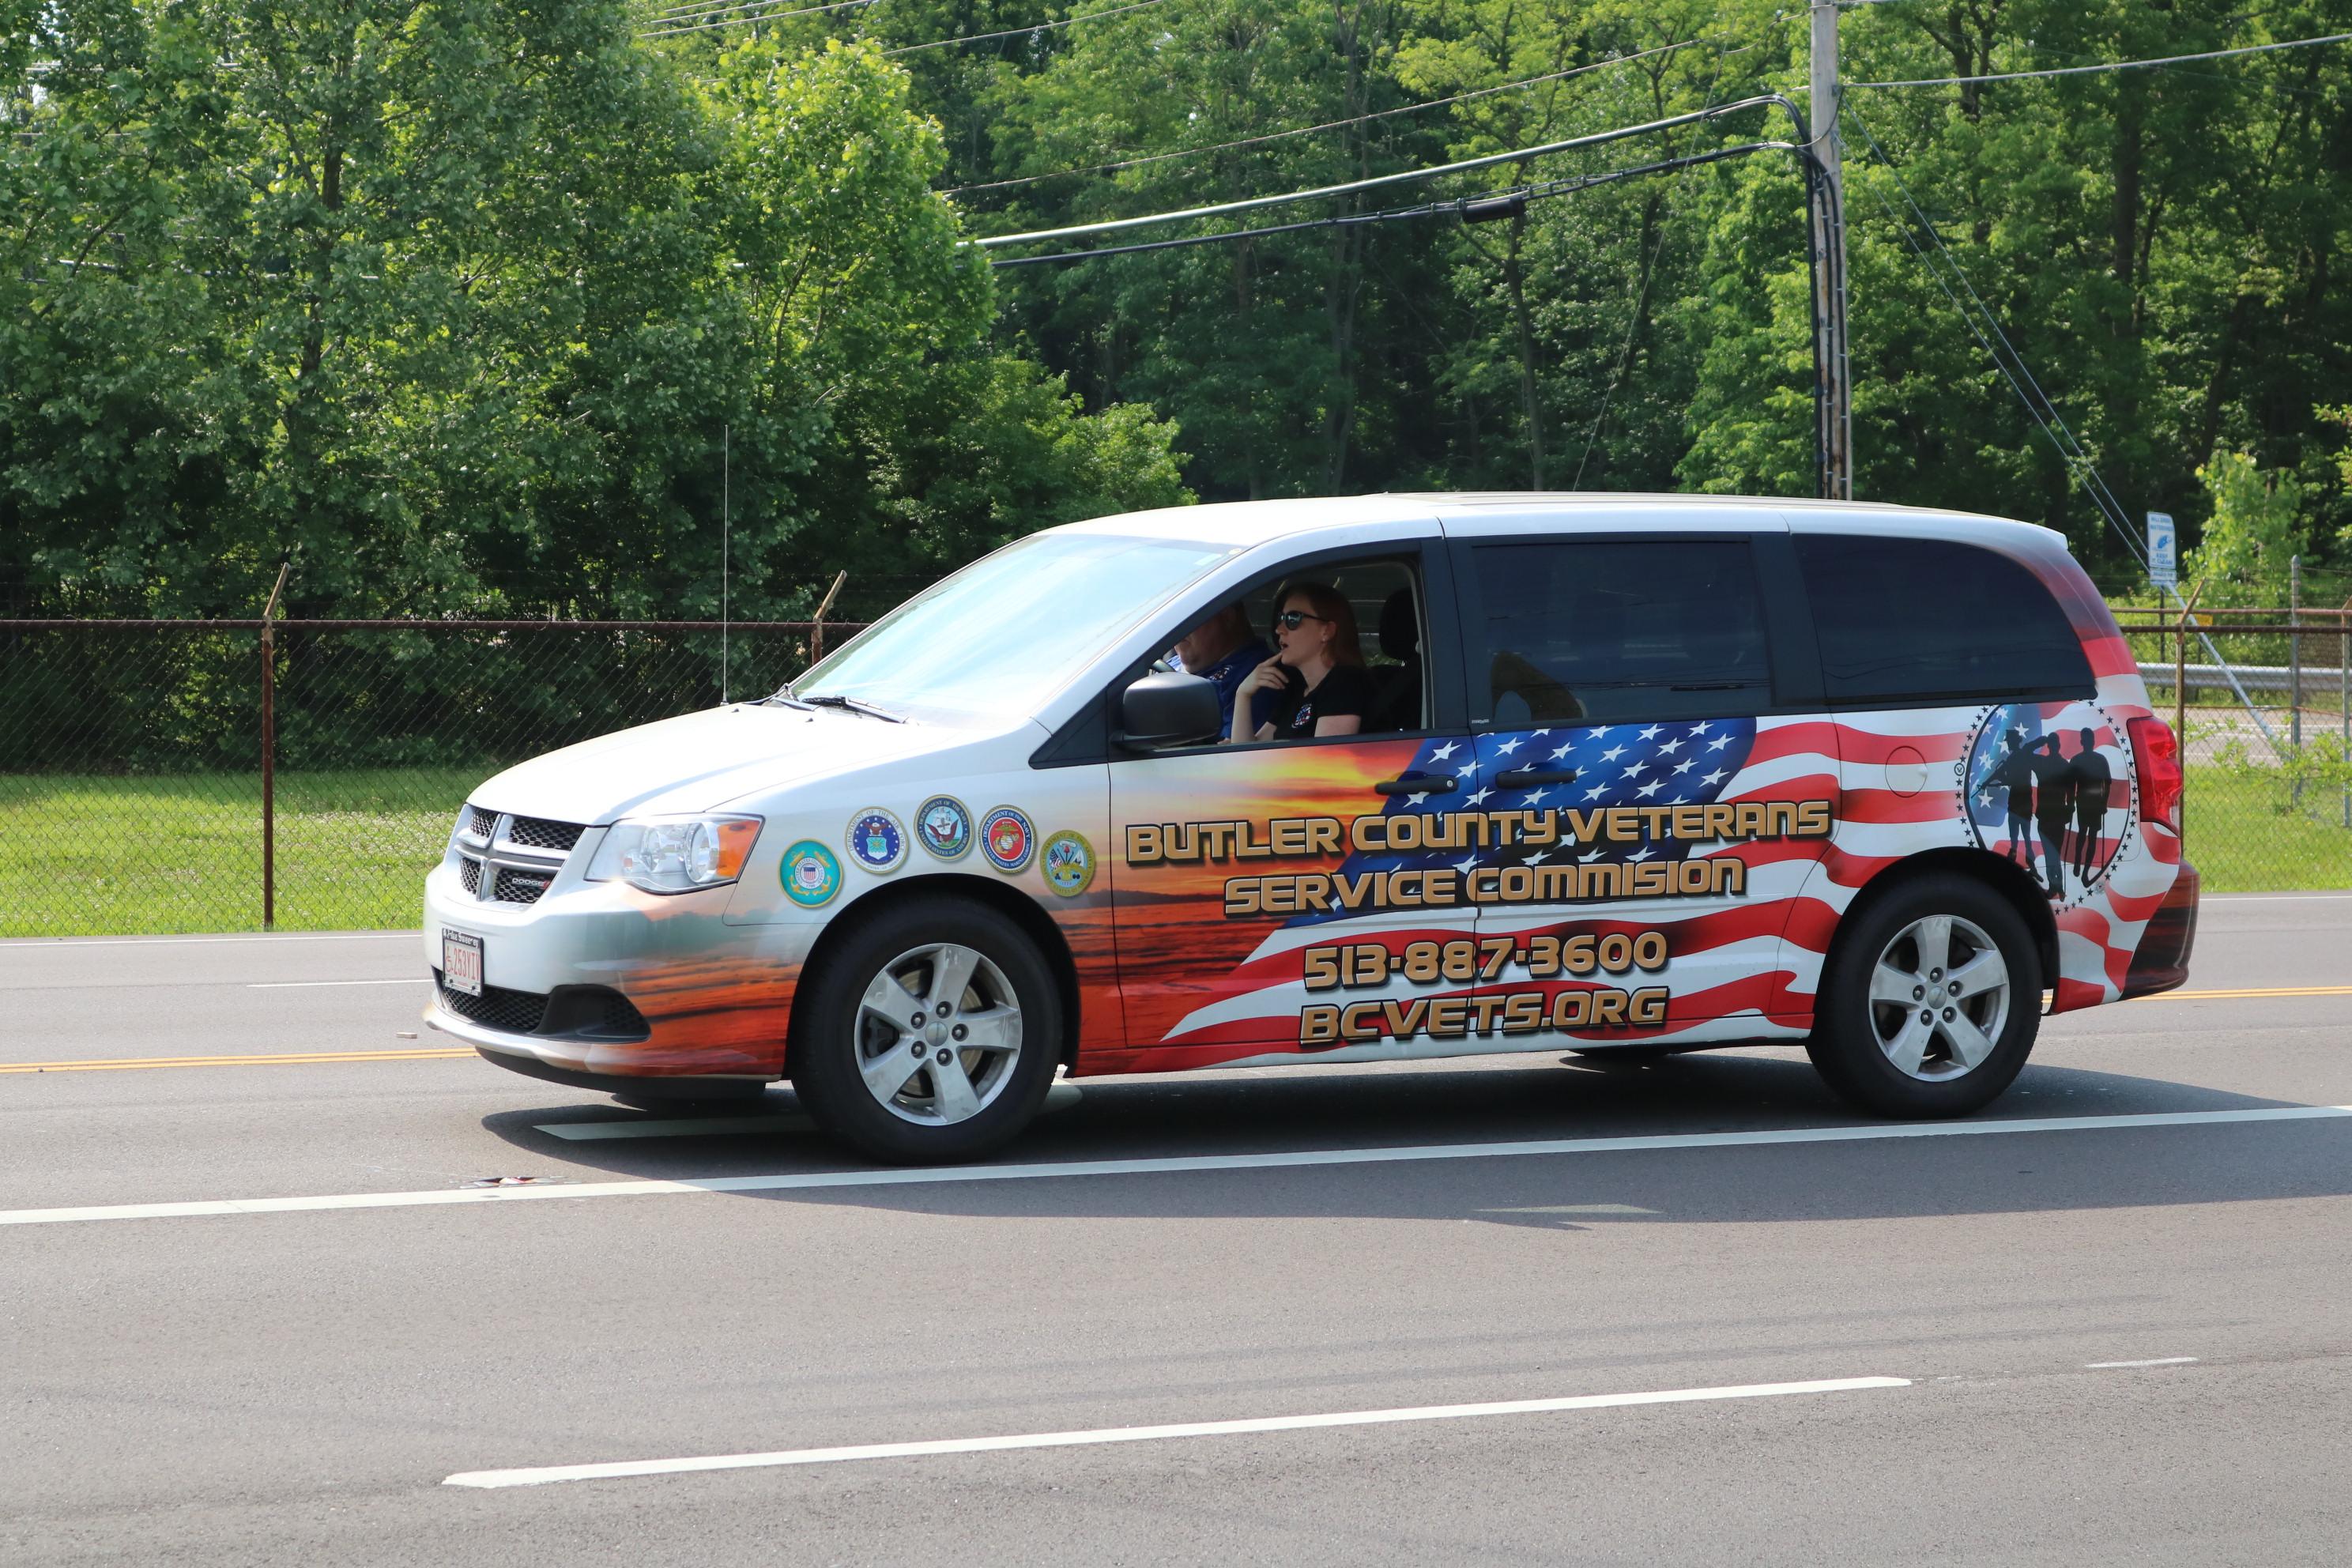 West Chester Ohio. Butler County Ohio. Memorial Day parade.